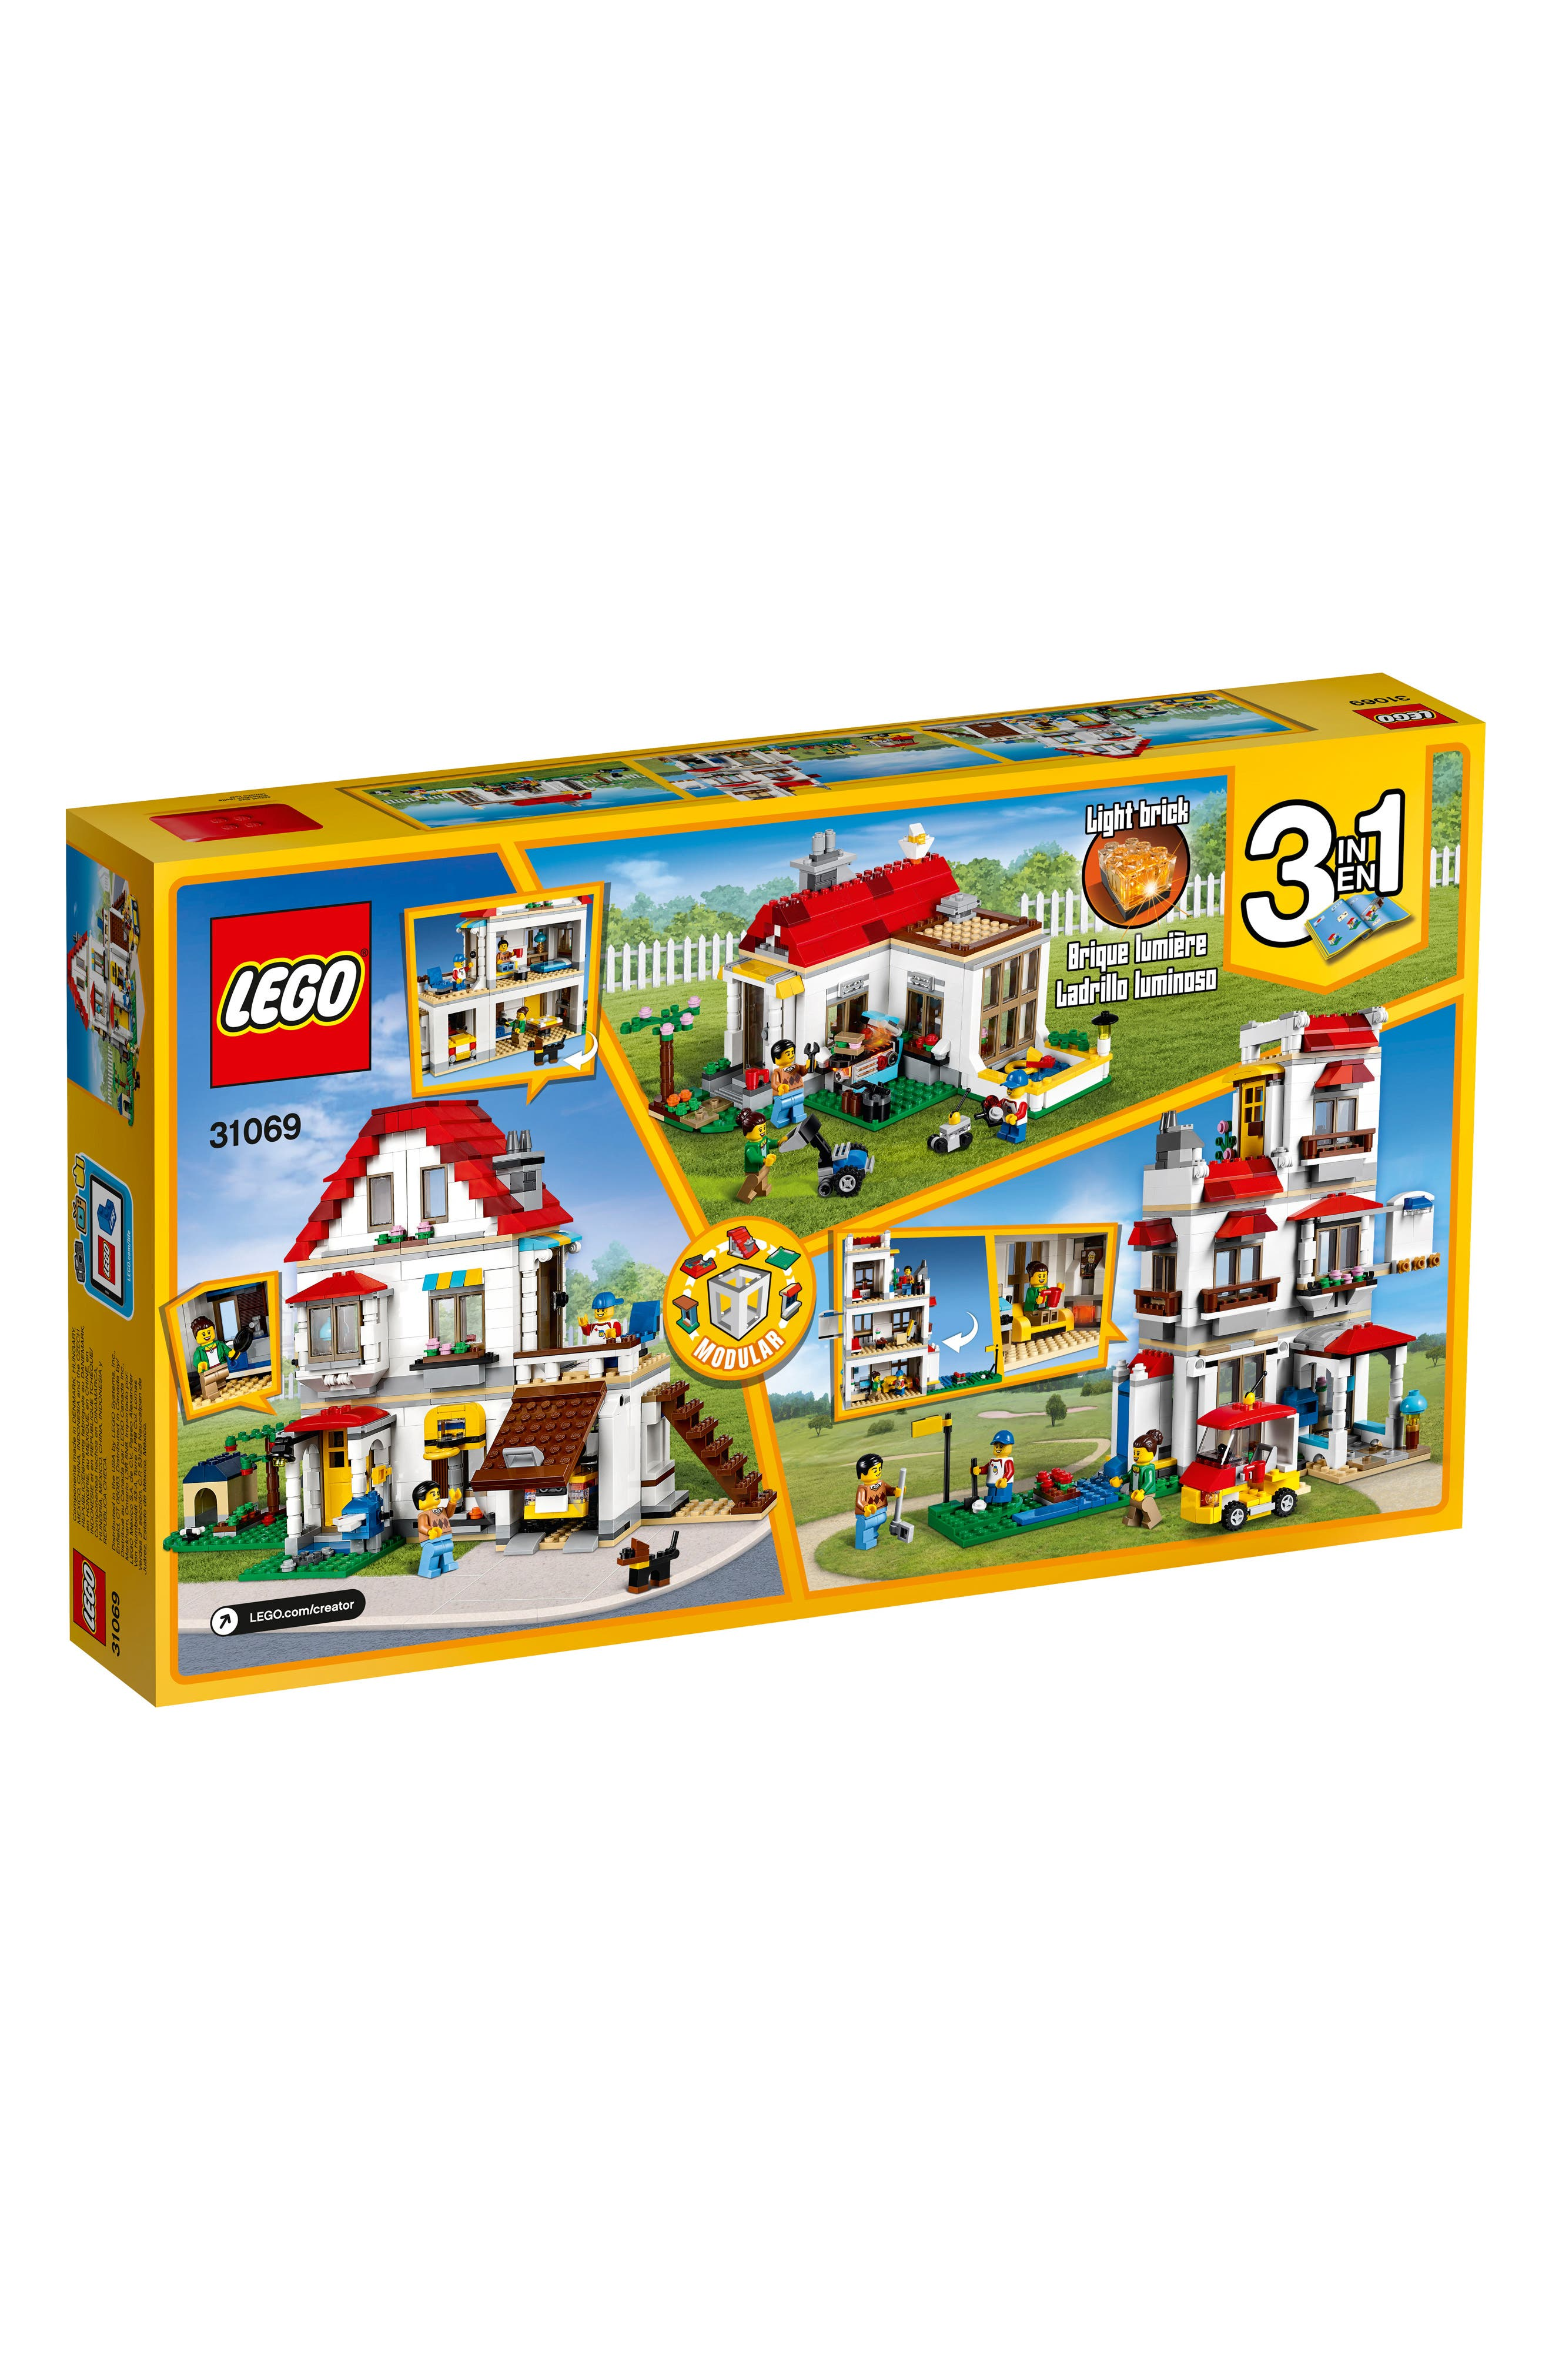 Main Image - LEGO® Creator Modular Family Villa Play Set - 31069